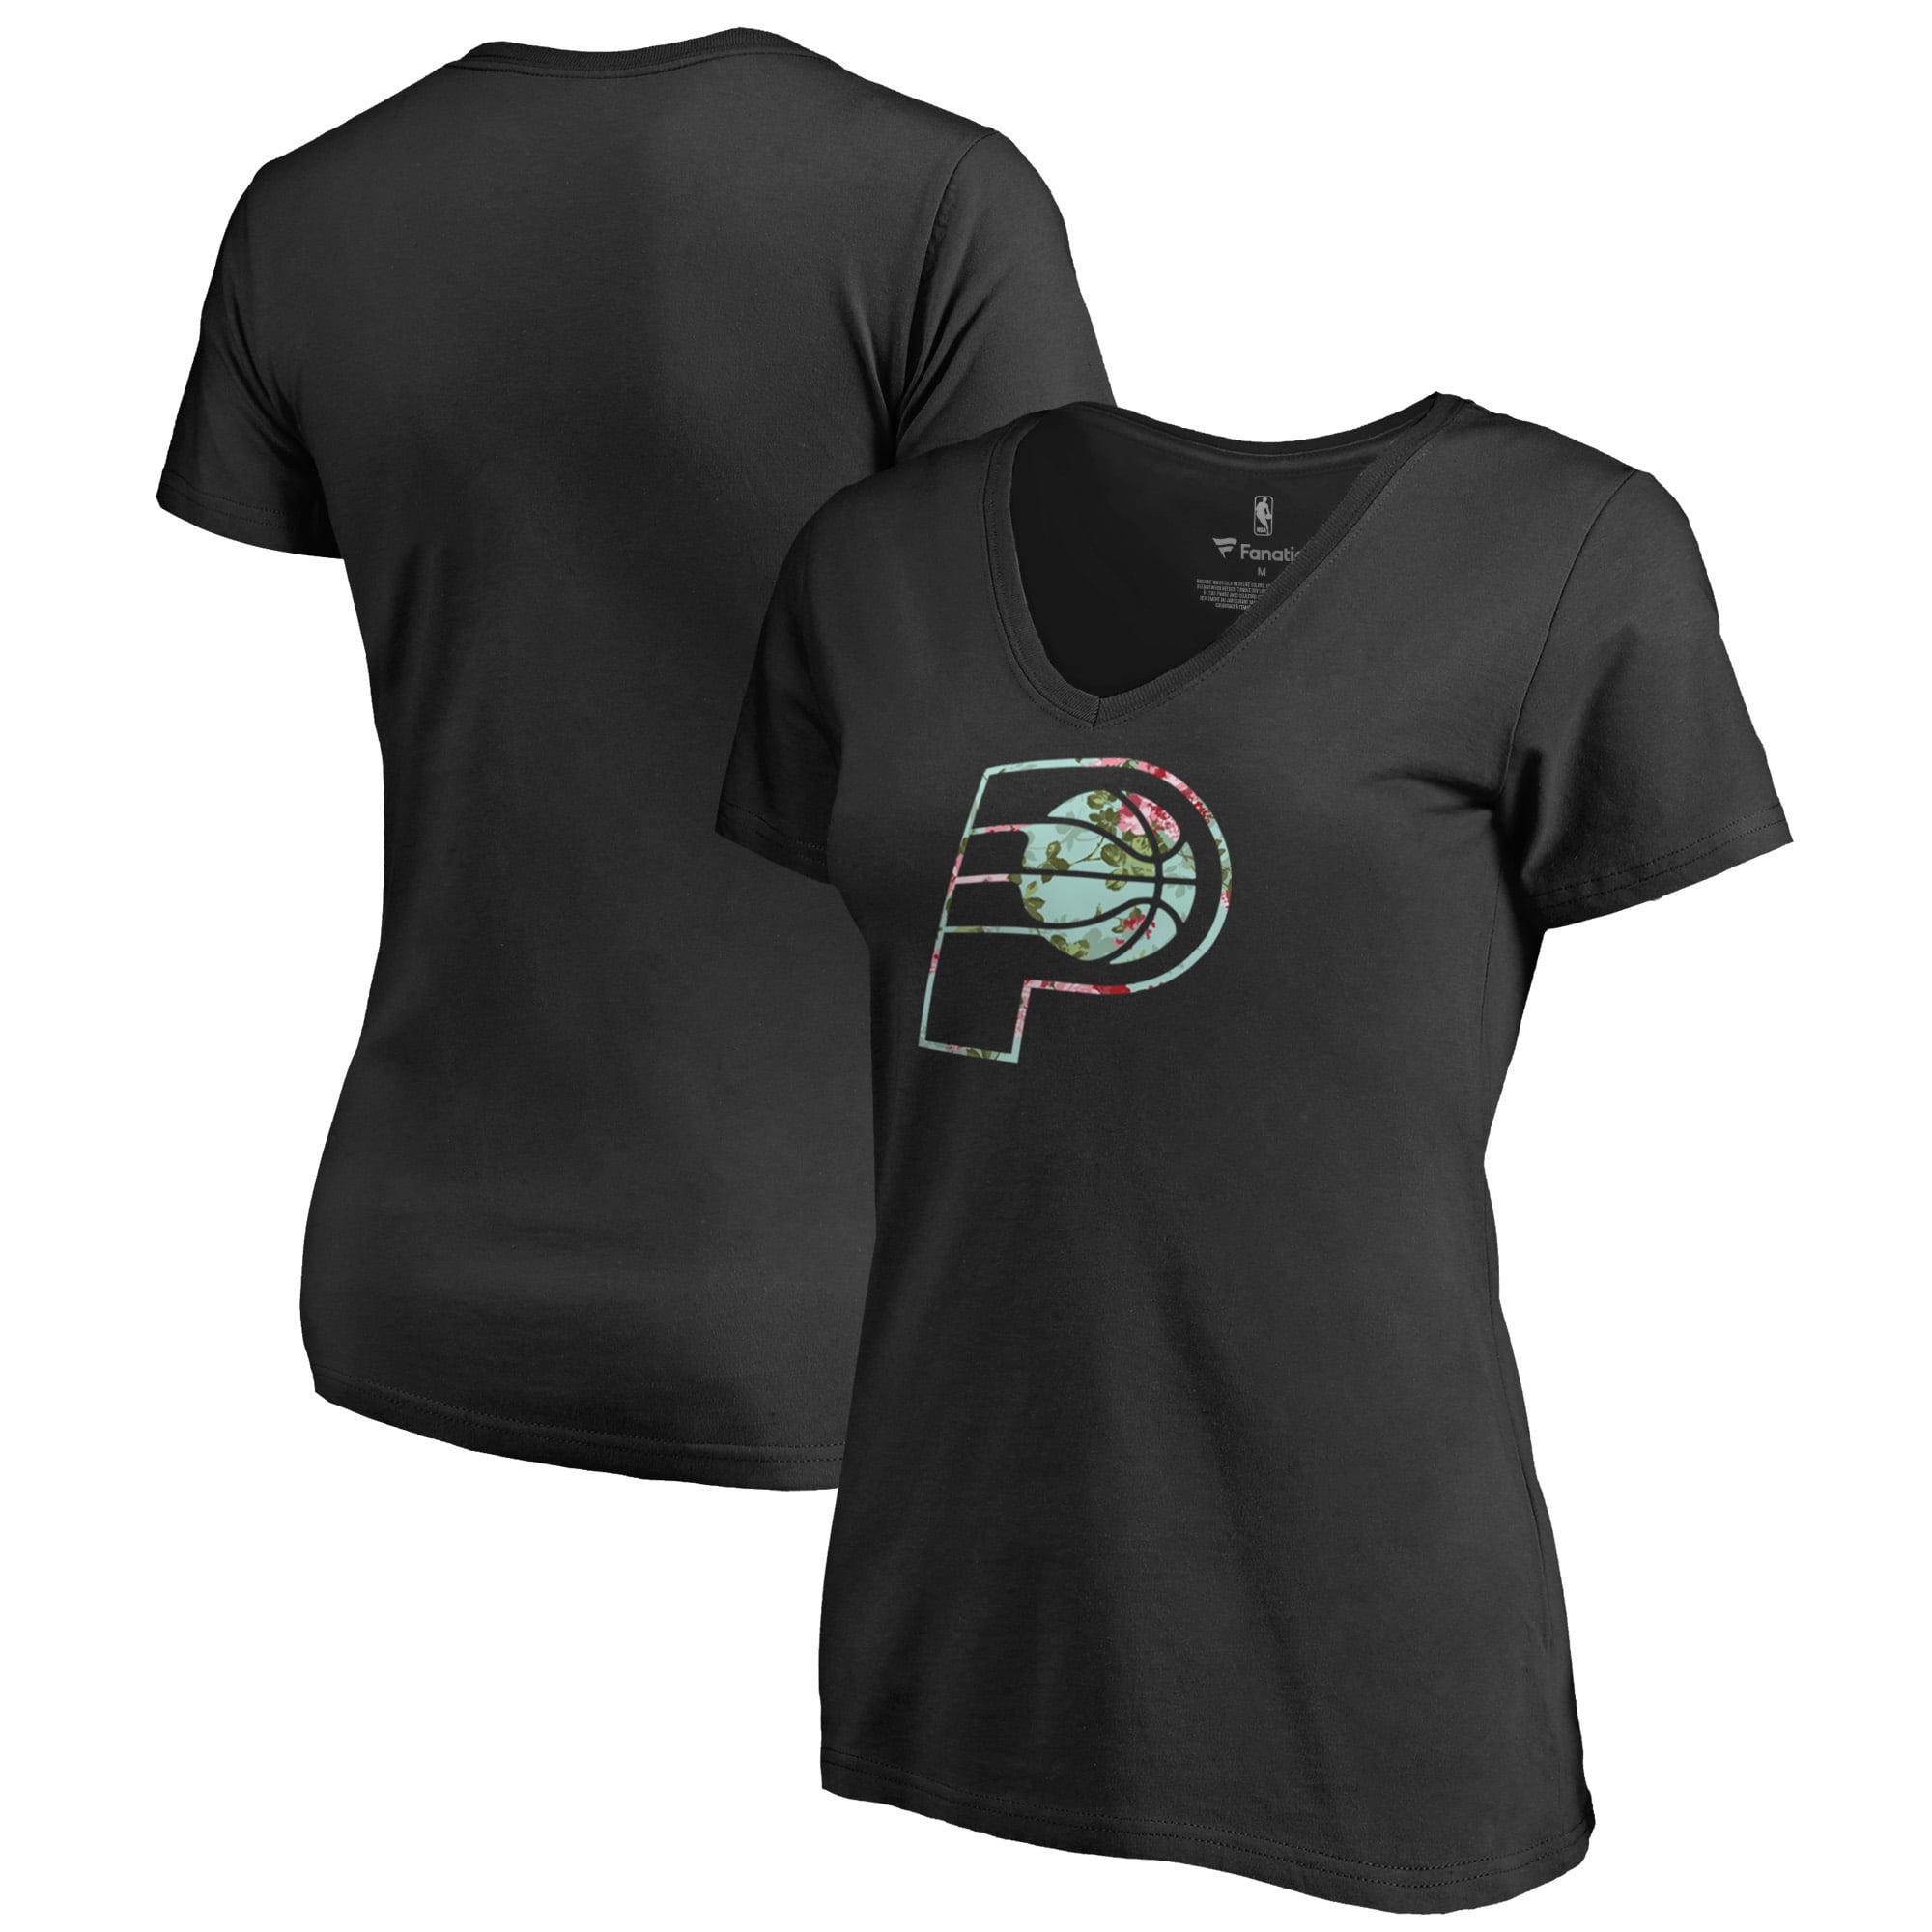 Indiana Pacers Fanatics Branded Lovely V-Neck T-Shirt - Black